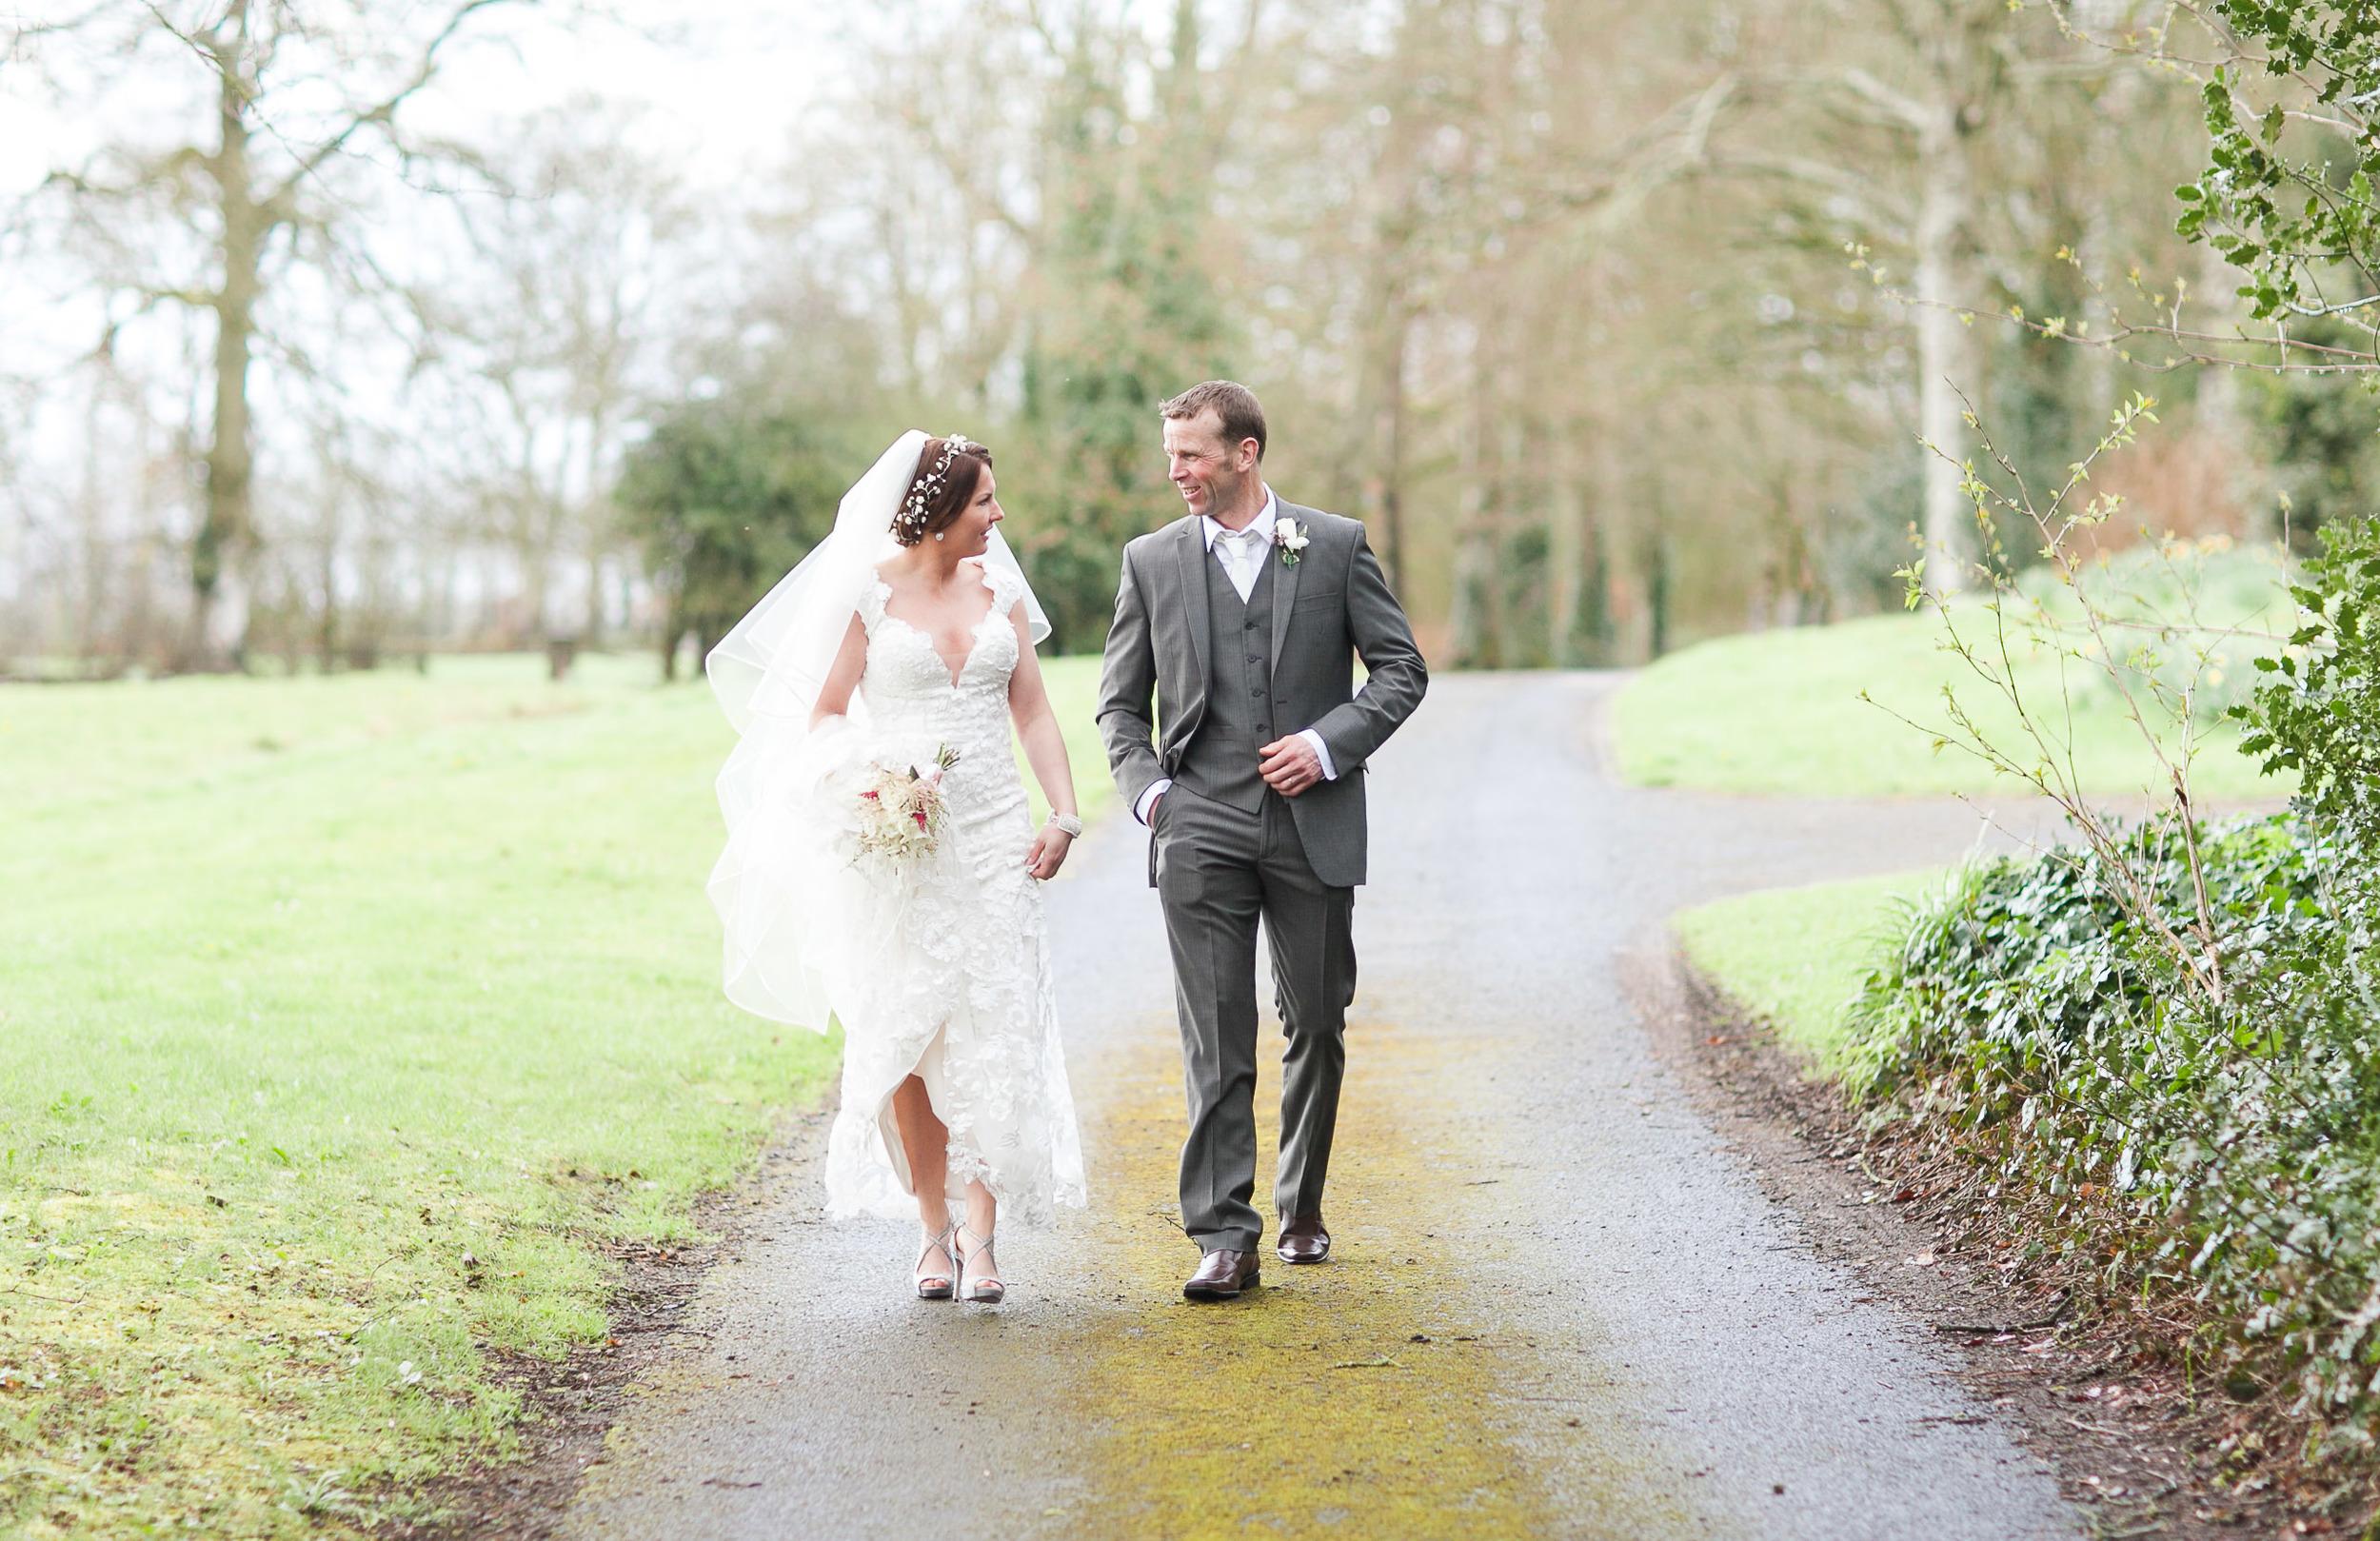 Ireland-Kildare-Wedding-Photographer-0012.jpg